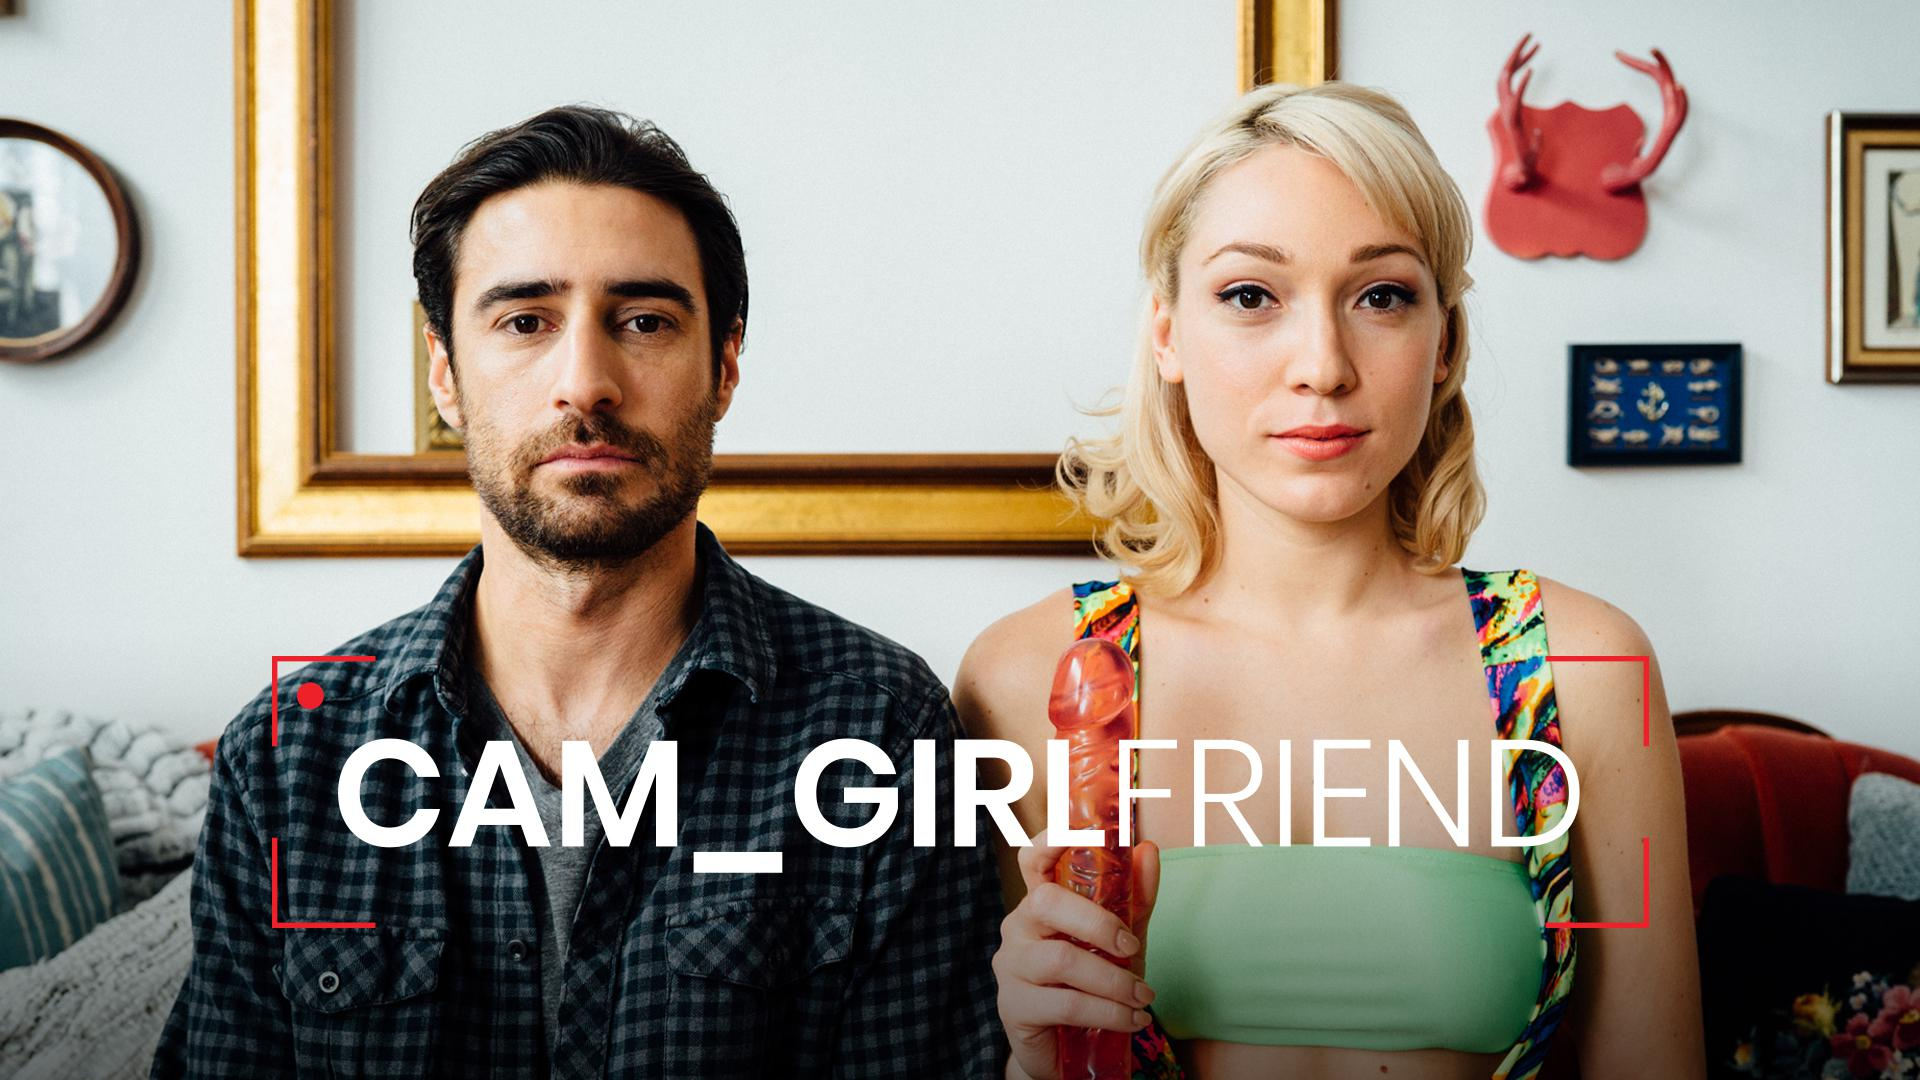 Cam_Girlfriend